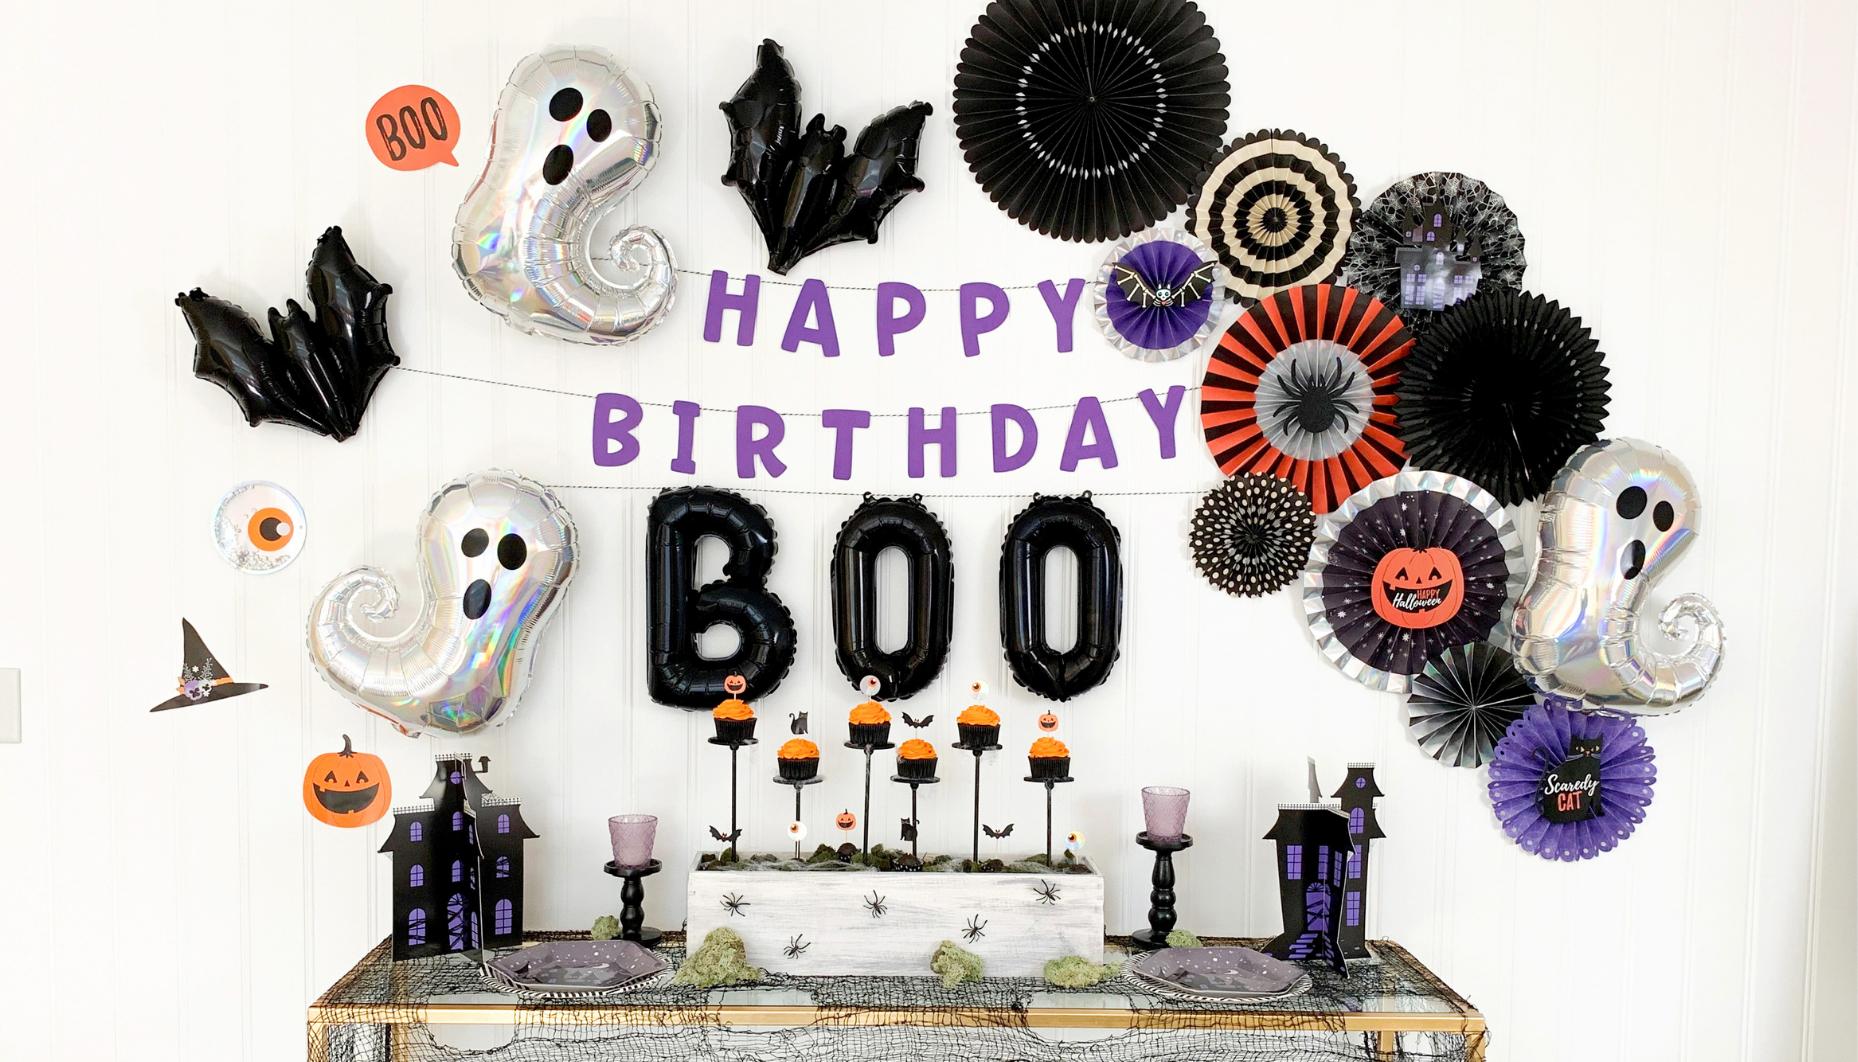 6 Happy Halloween Glitter Centerpiece Sticks  Halloween Decorations  Halloween Party Decor  Halloween Cake Topper  Table Decorations